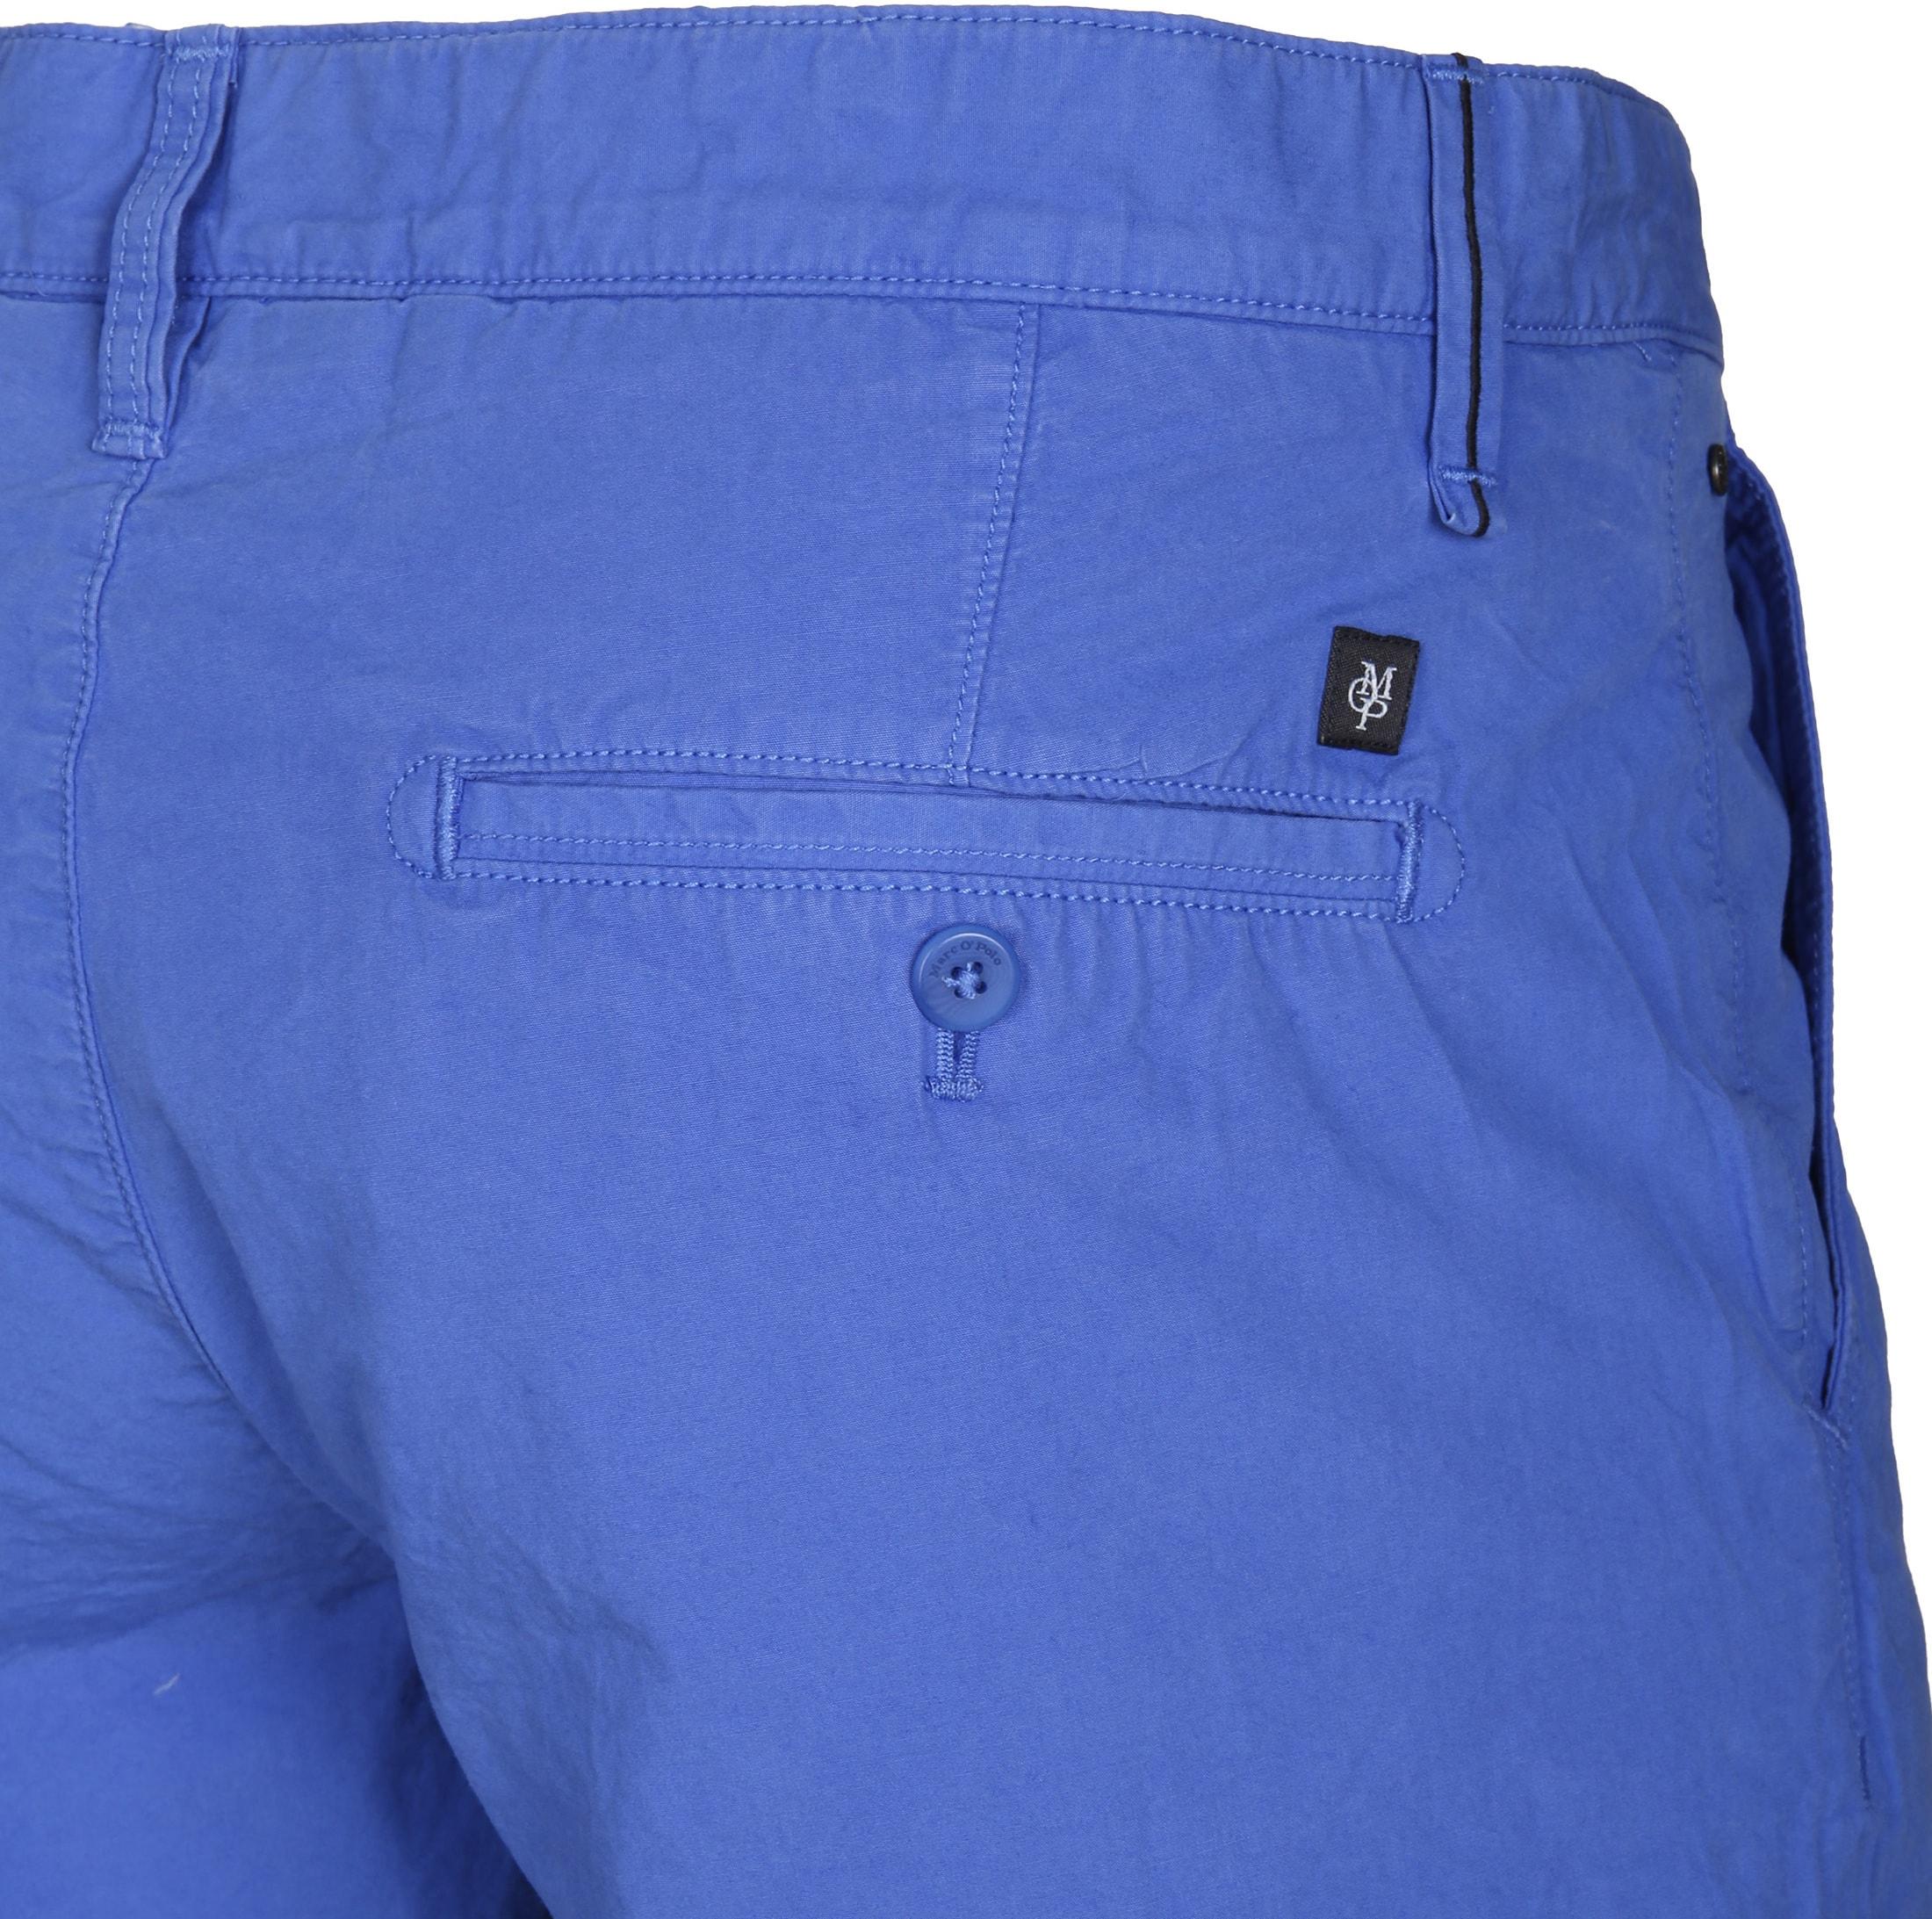 Marc O'Polo Bermuda Uni Blau foto 1